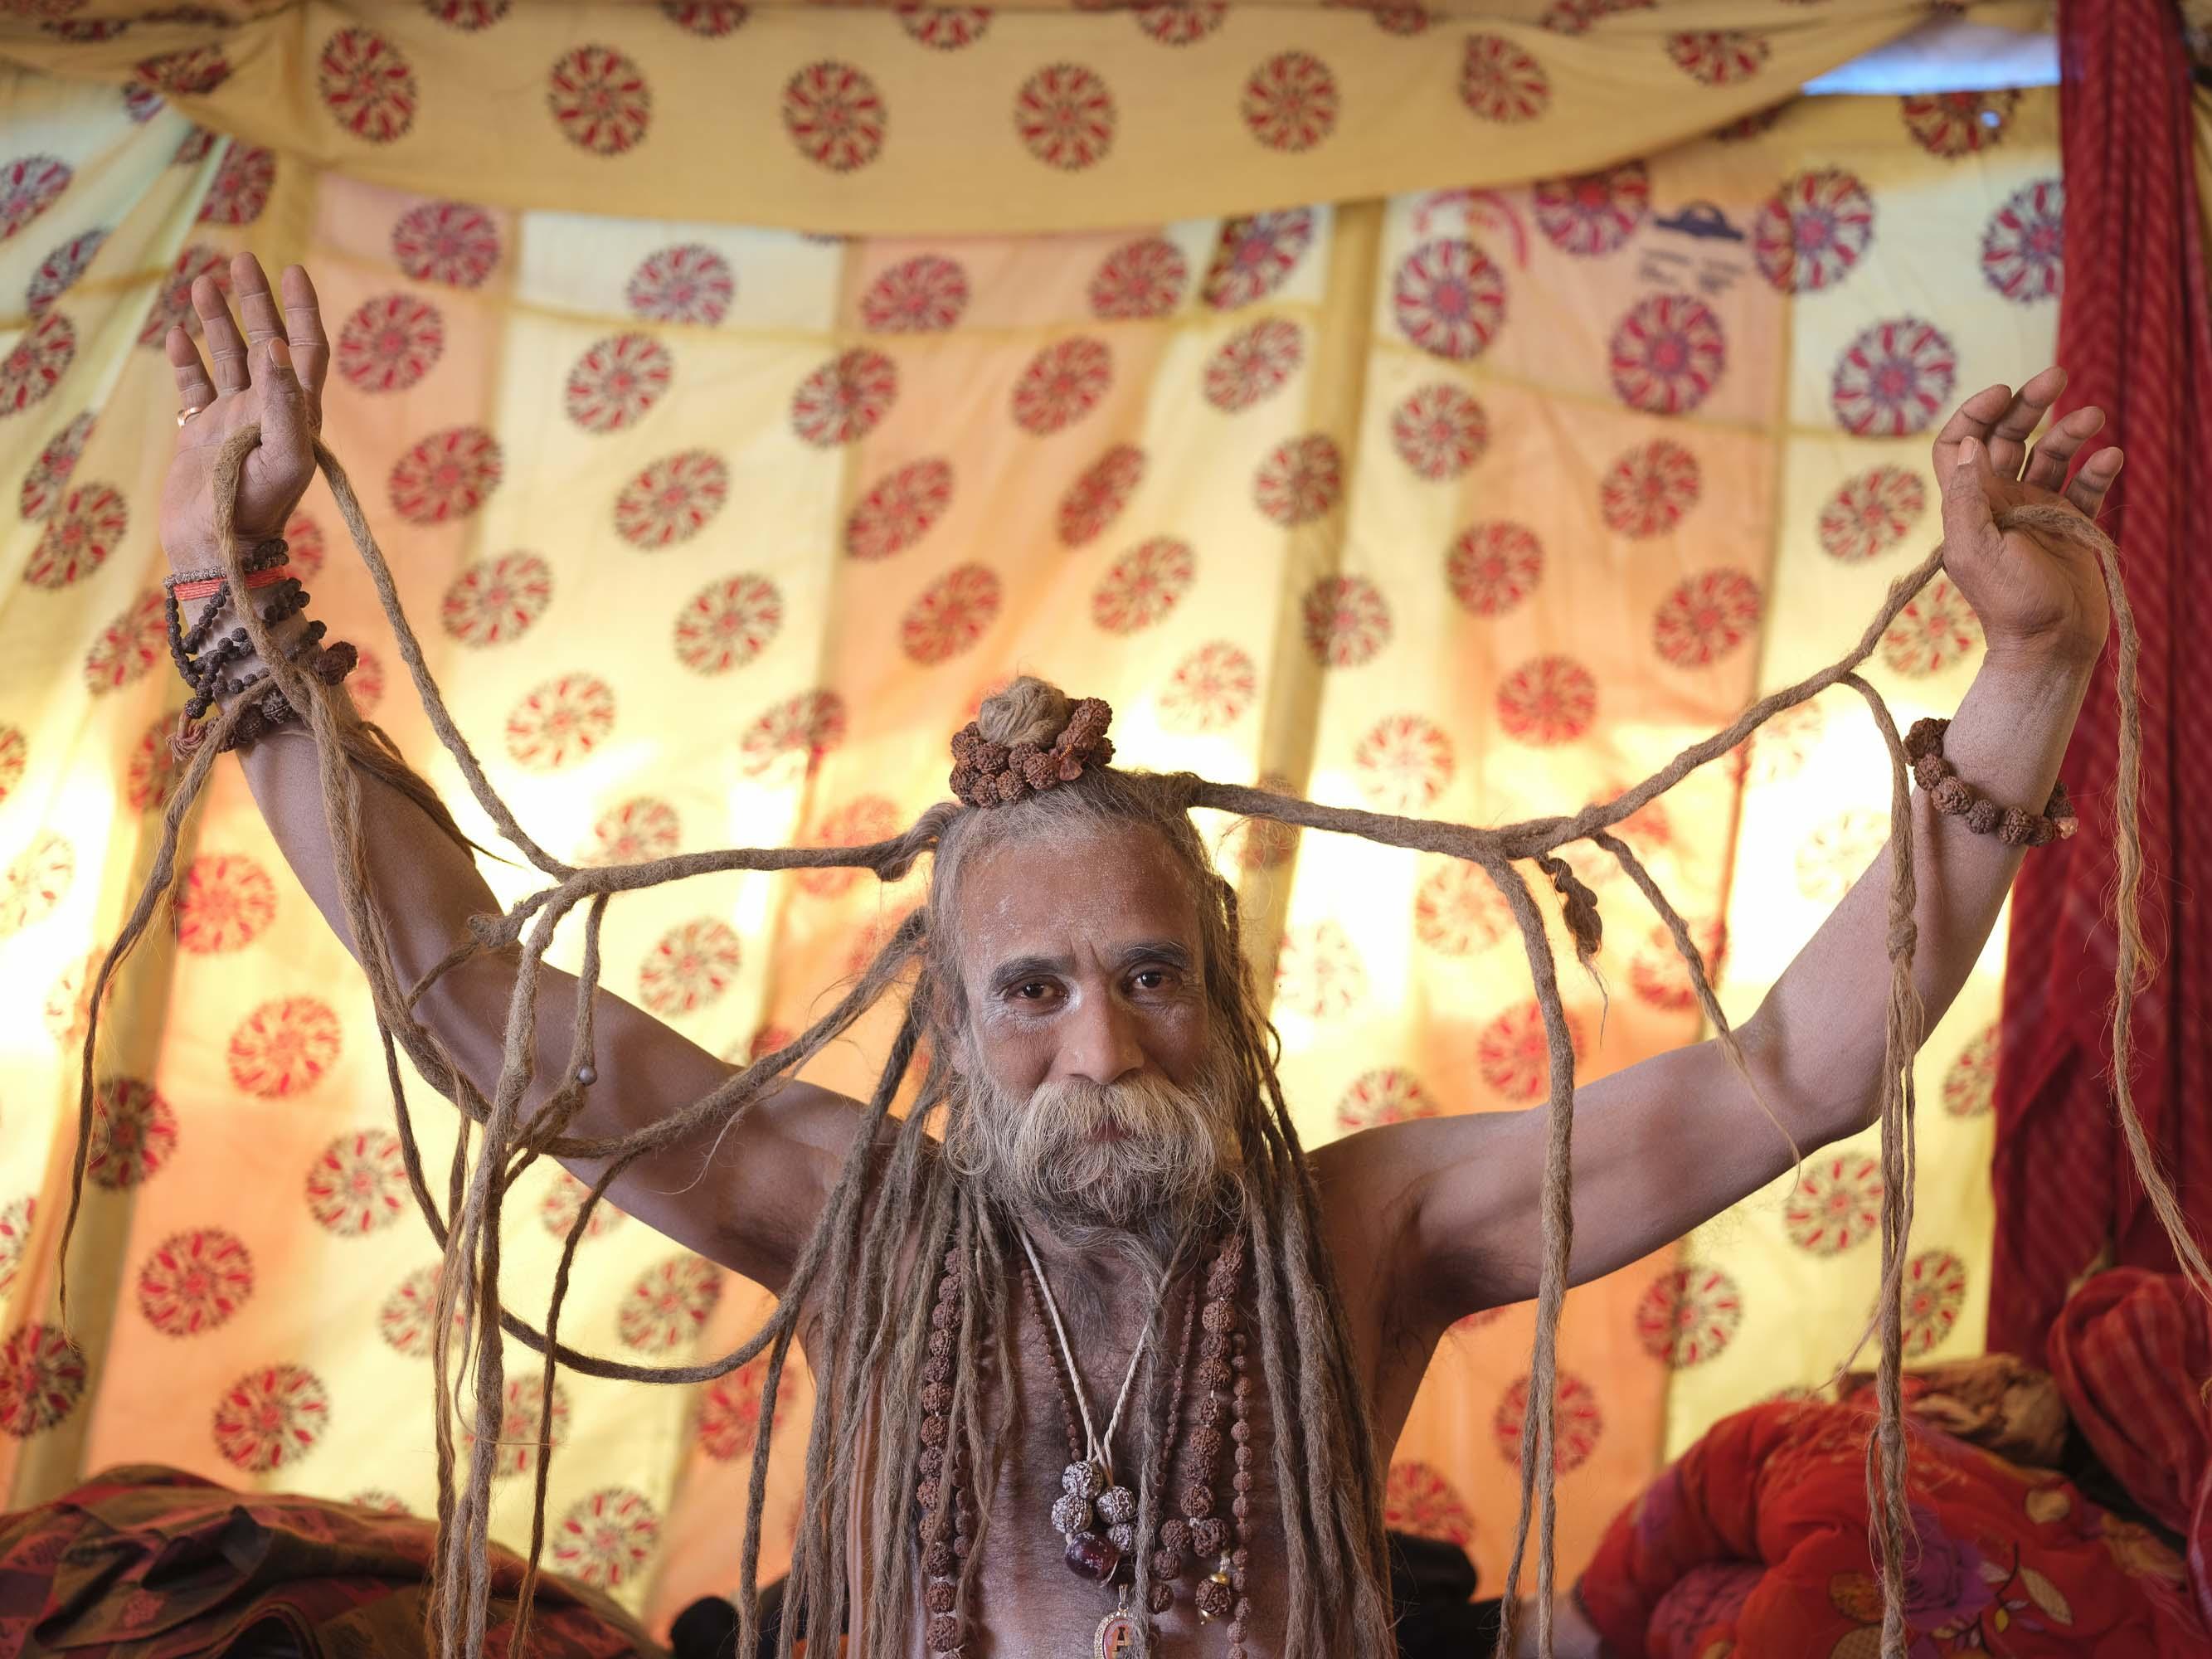 baba tent rasta pilgrims Kumbh mela 2019 gfx 50R fujifilm India Allahabad Prayagraj Ardh hindu religious Festival event rivers photographer jose jeuland photography